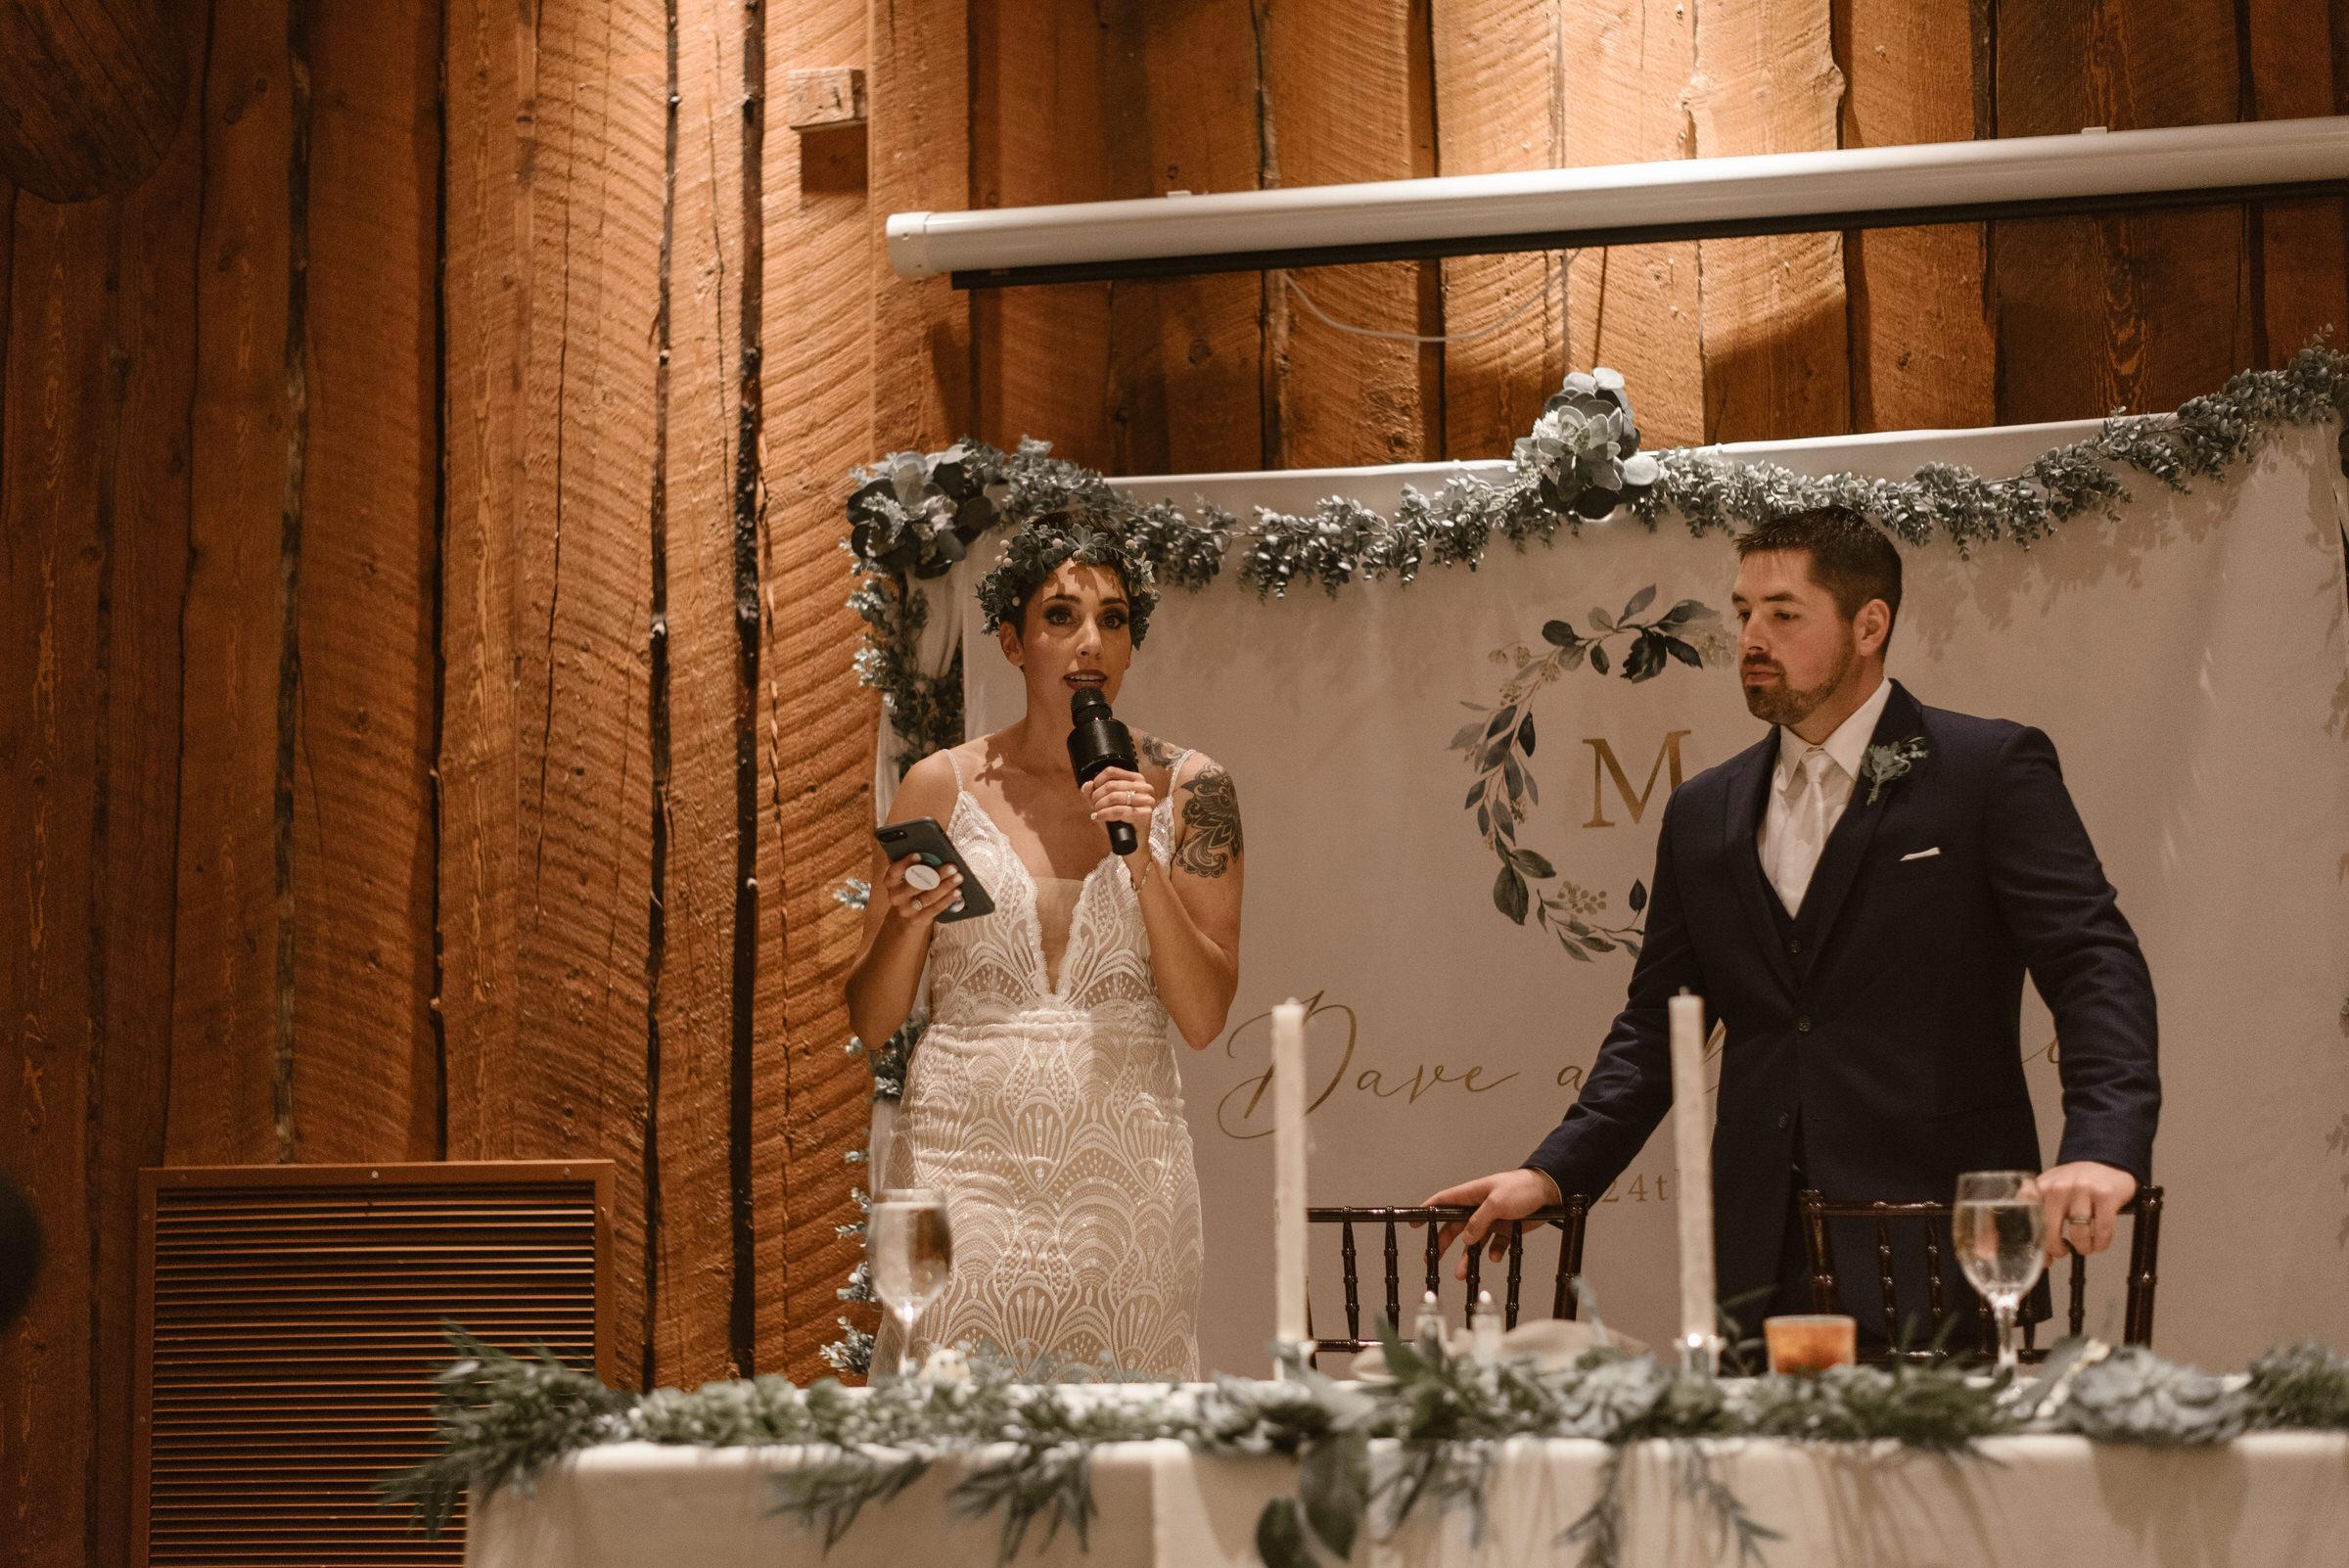 Wilderness-Ridge-Lincoln-Nebraska-Wedding-Kaylie-Sirek-Photography-099.jpg